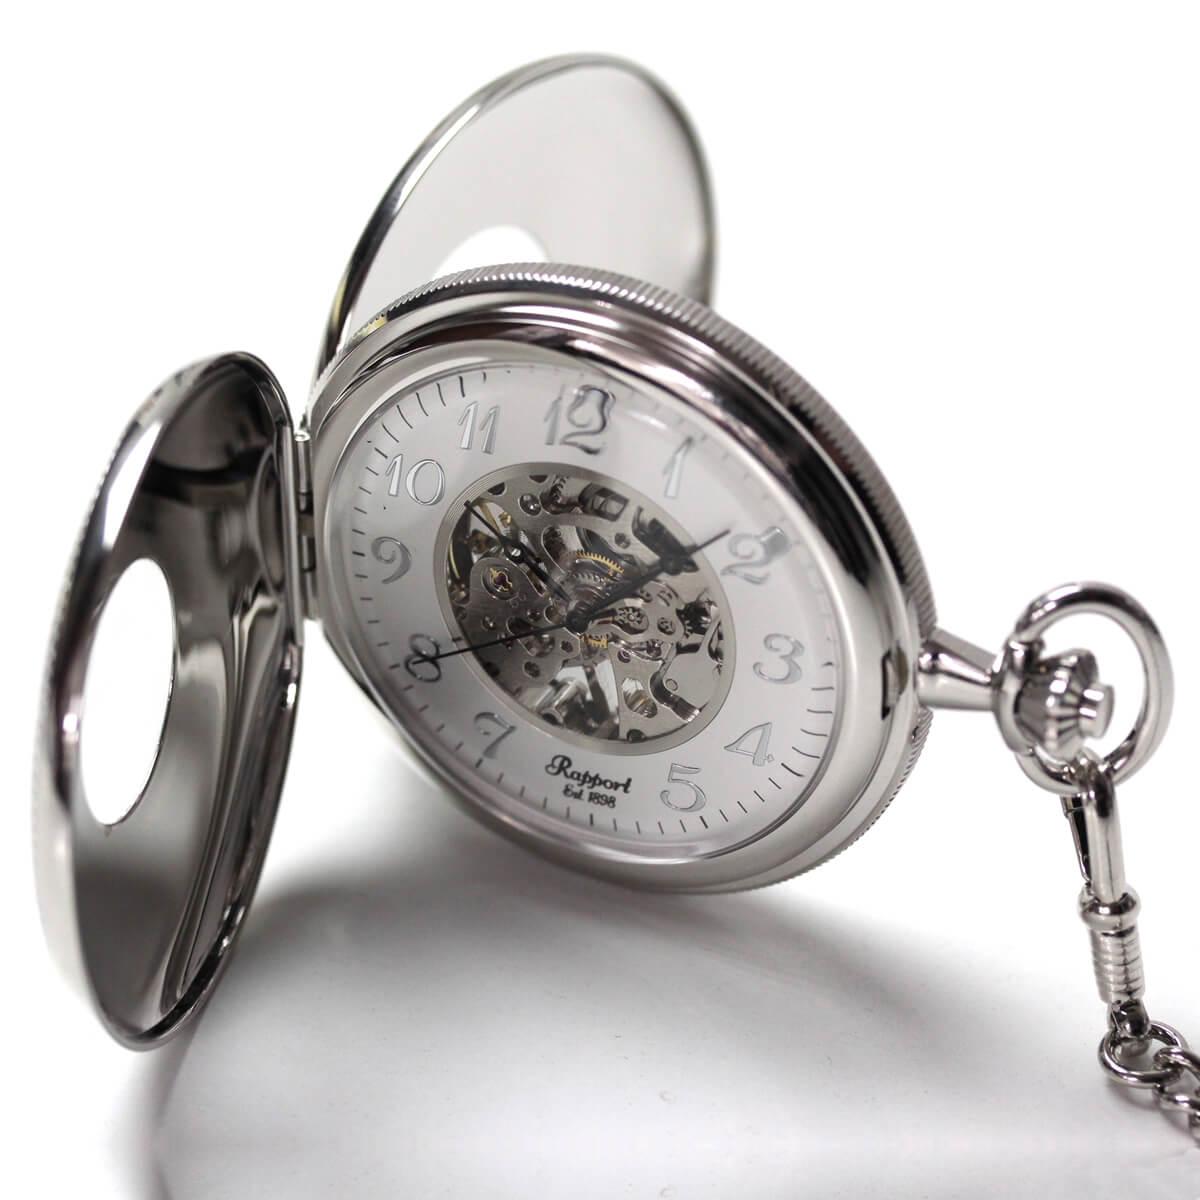 pw47 ラポート 両蓋開き懐中時計